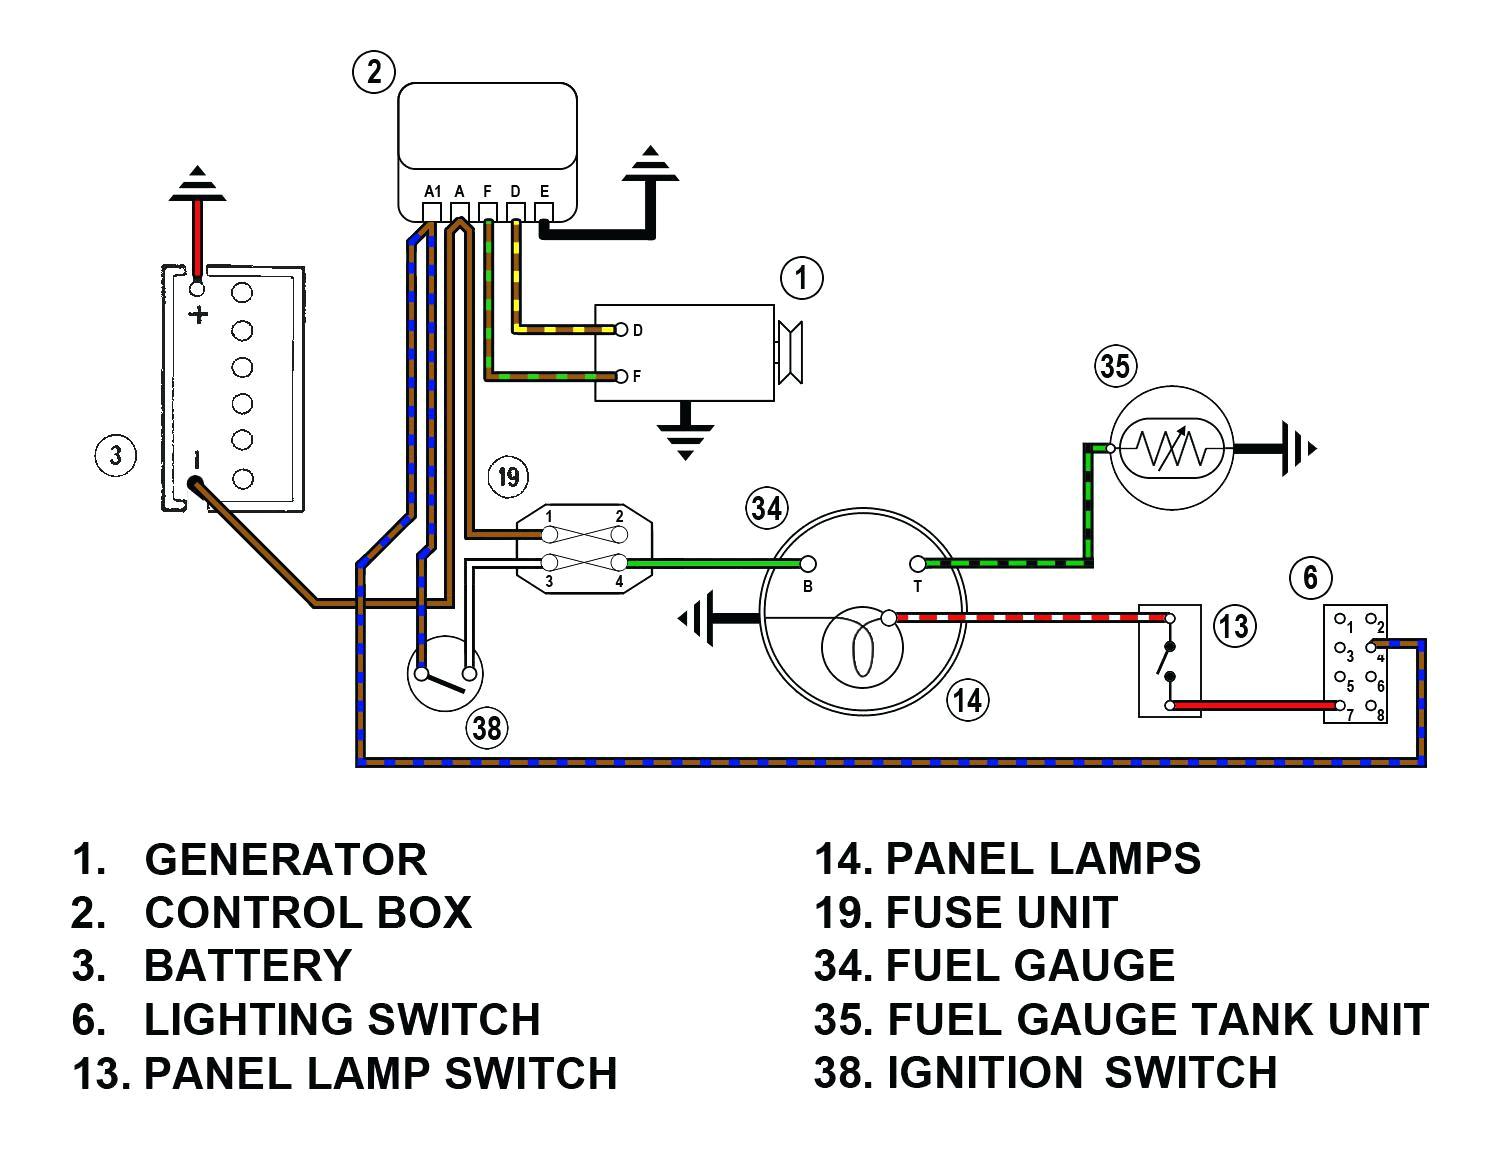 hawke dump trailer wiring diagram gooseneck wiring diagram download gooseneck trailer wiring diagram elegant dump trailer wiring diagram hawke travel 14q jpg